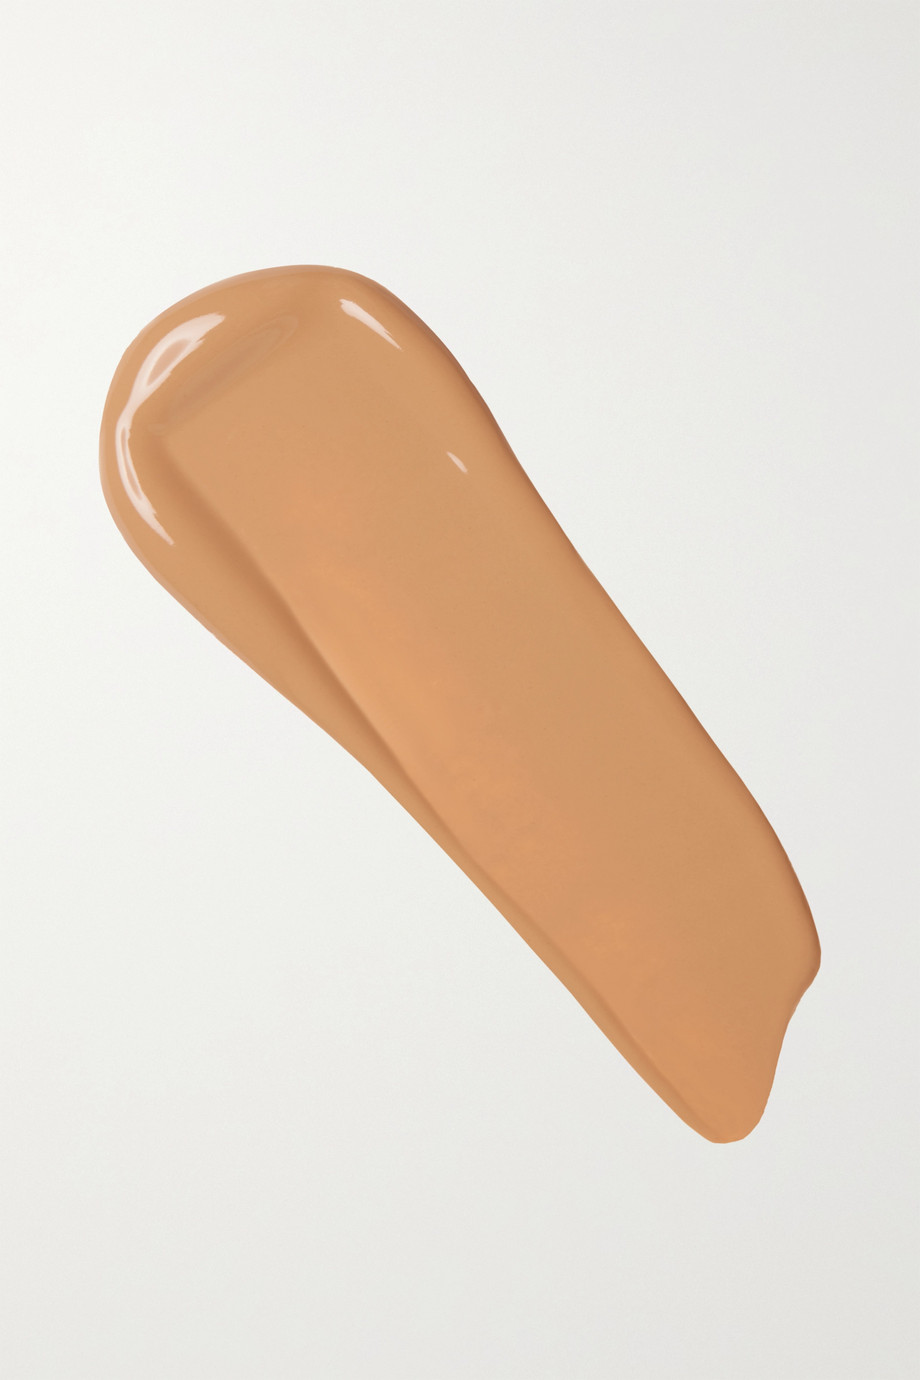 Surratt Beauty Dew Drop Foundation - 9, 19ml